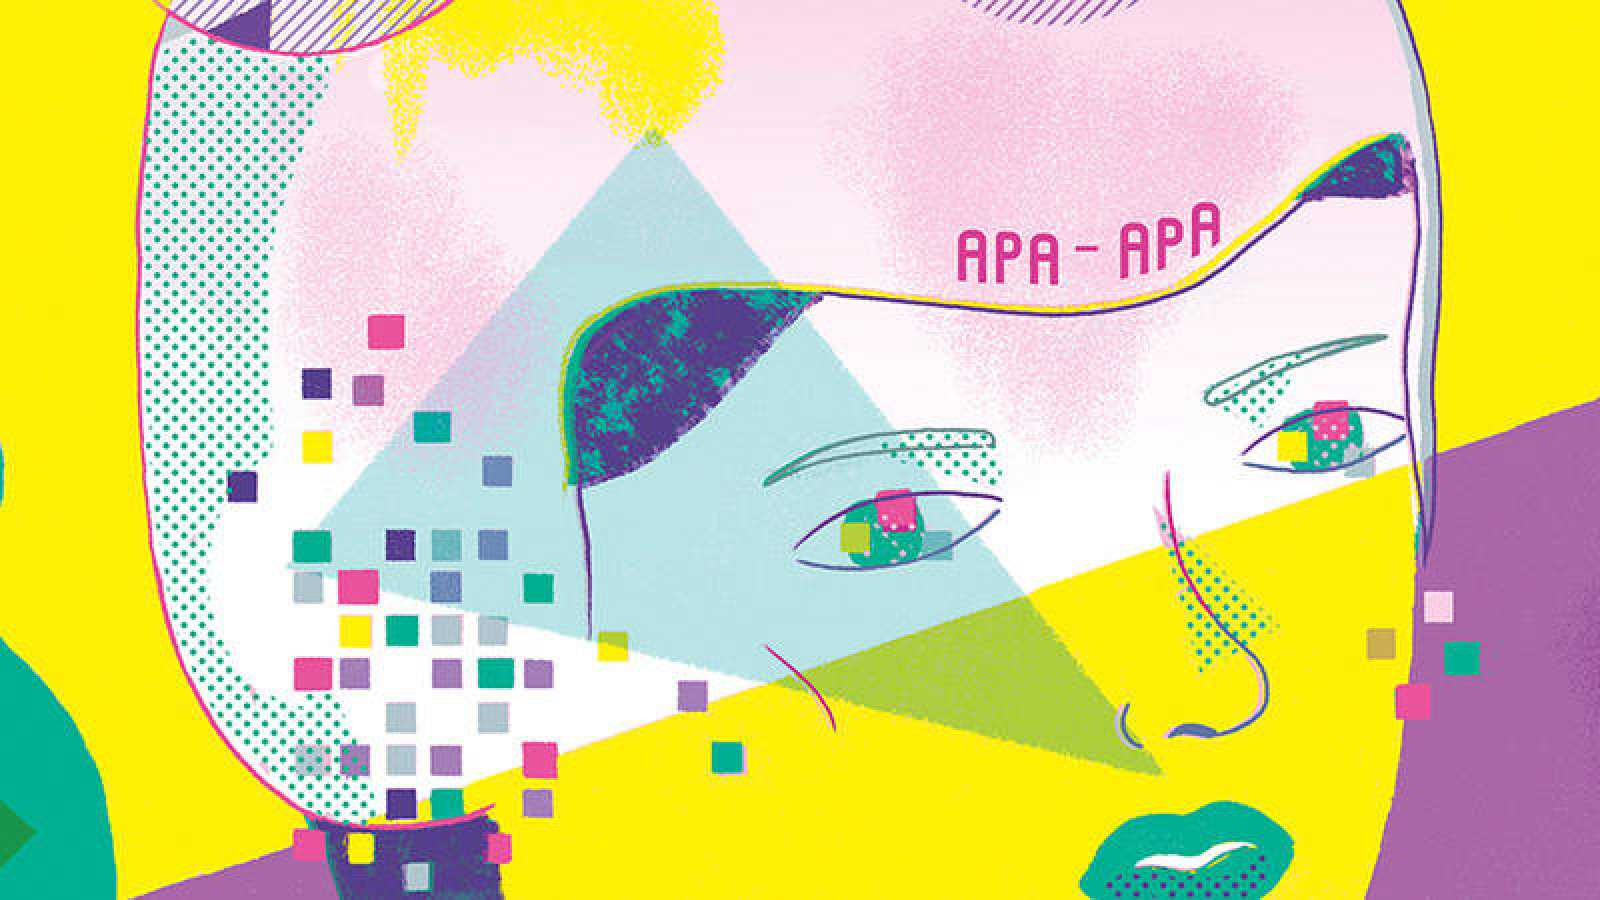 Fragmento de la portada de 'Pulse enter para continuar', de Ana Galvañ